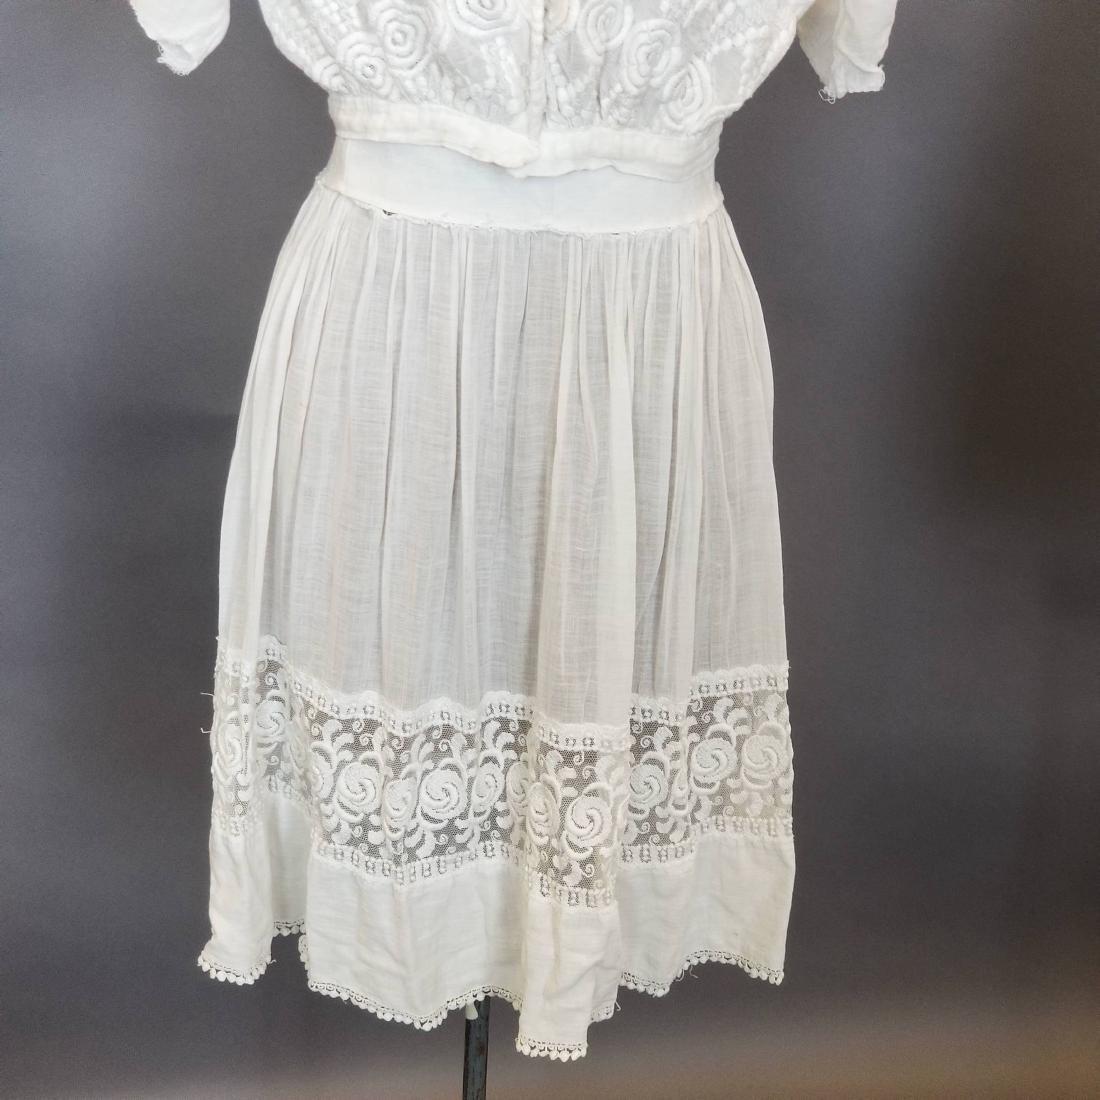 Three Piece White Day Dress - 3